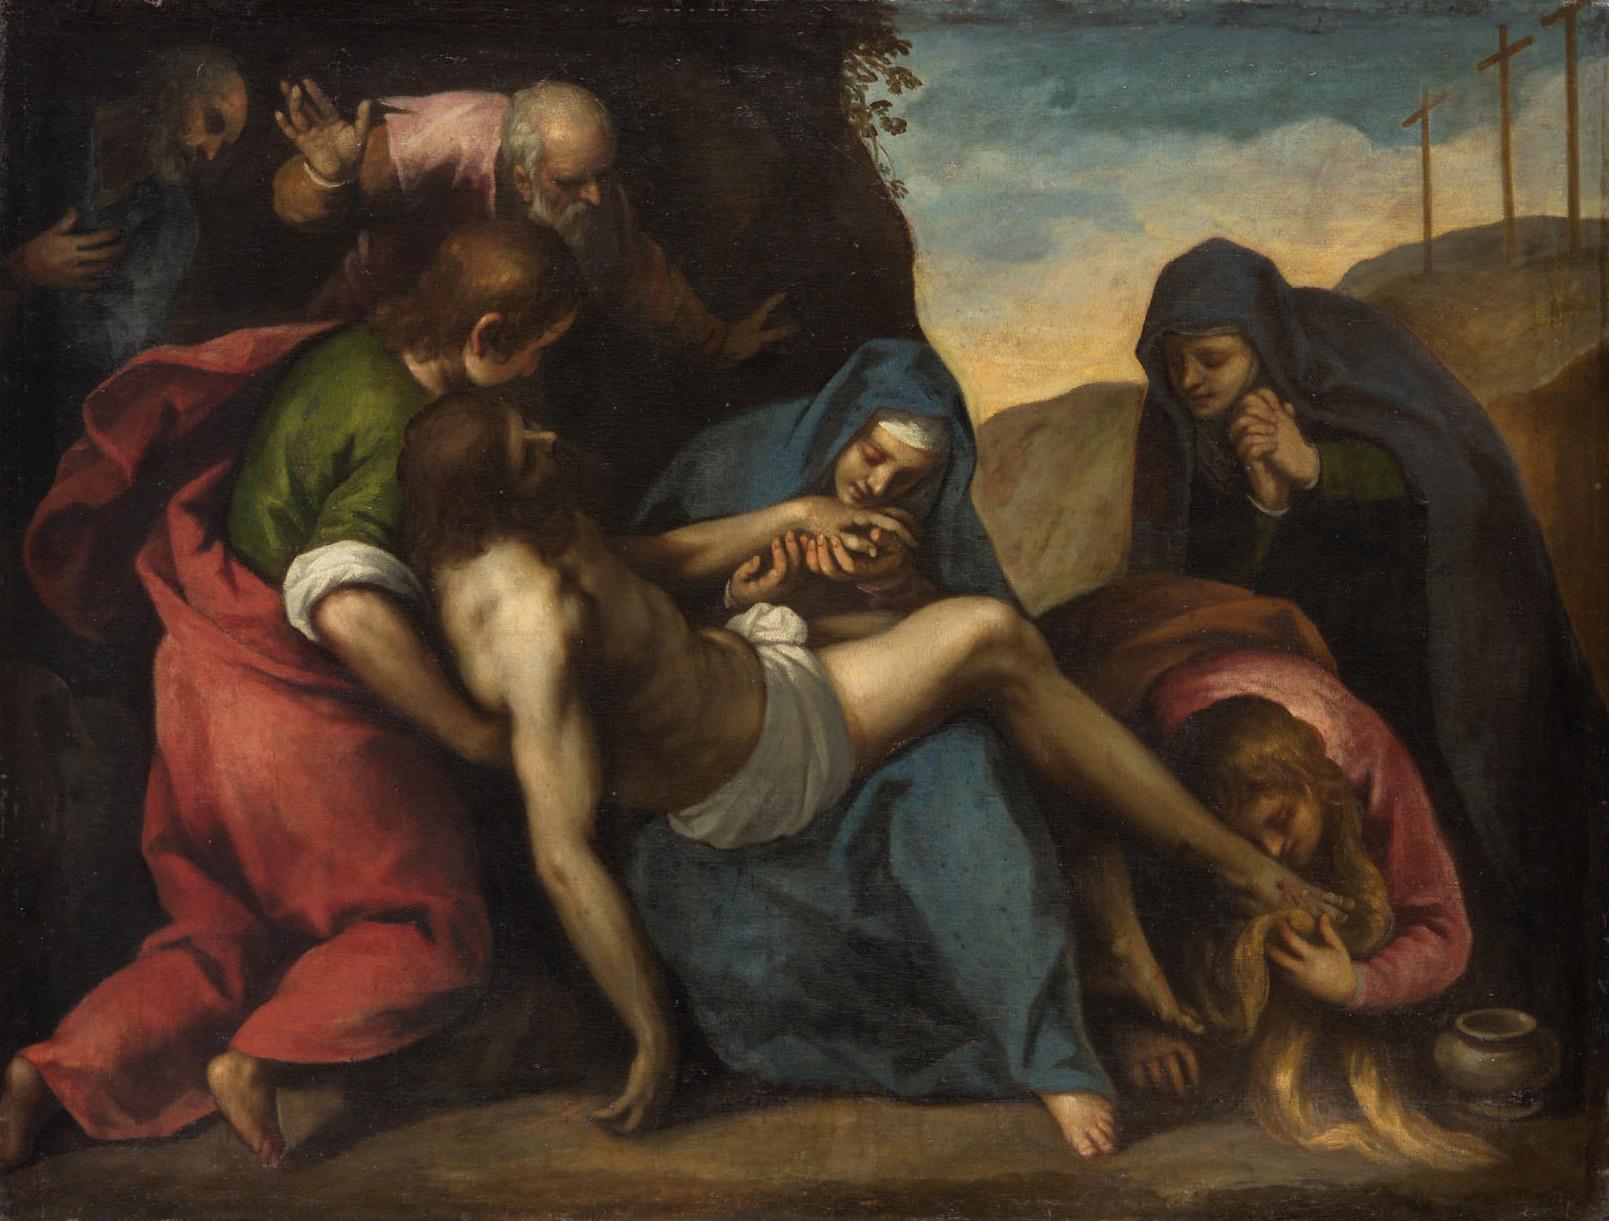 Beweinung Christi von Jacopo Negretti, gen. Palma il Giovane